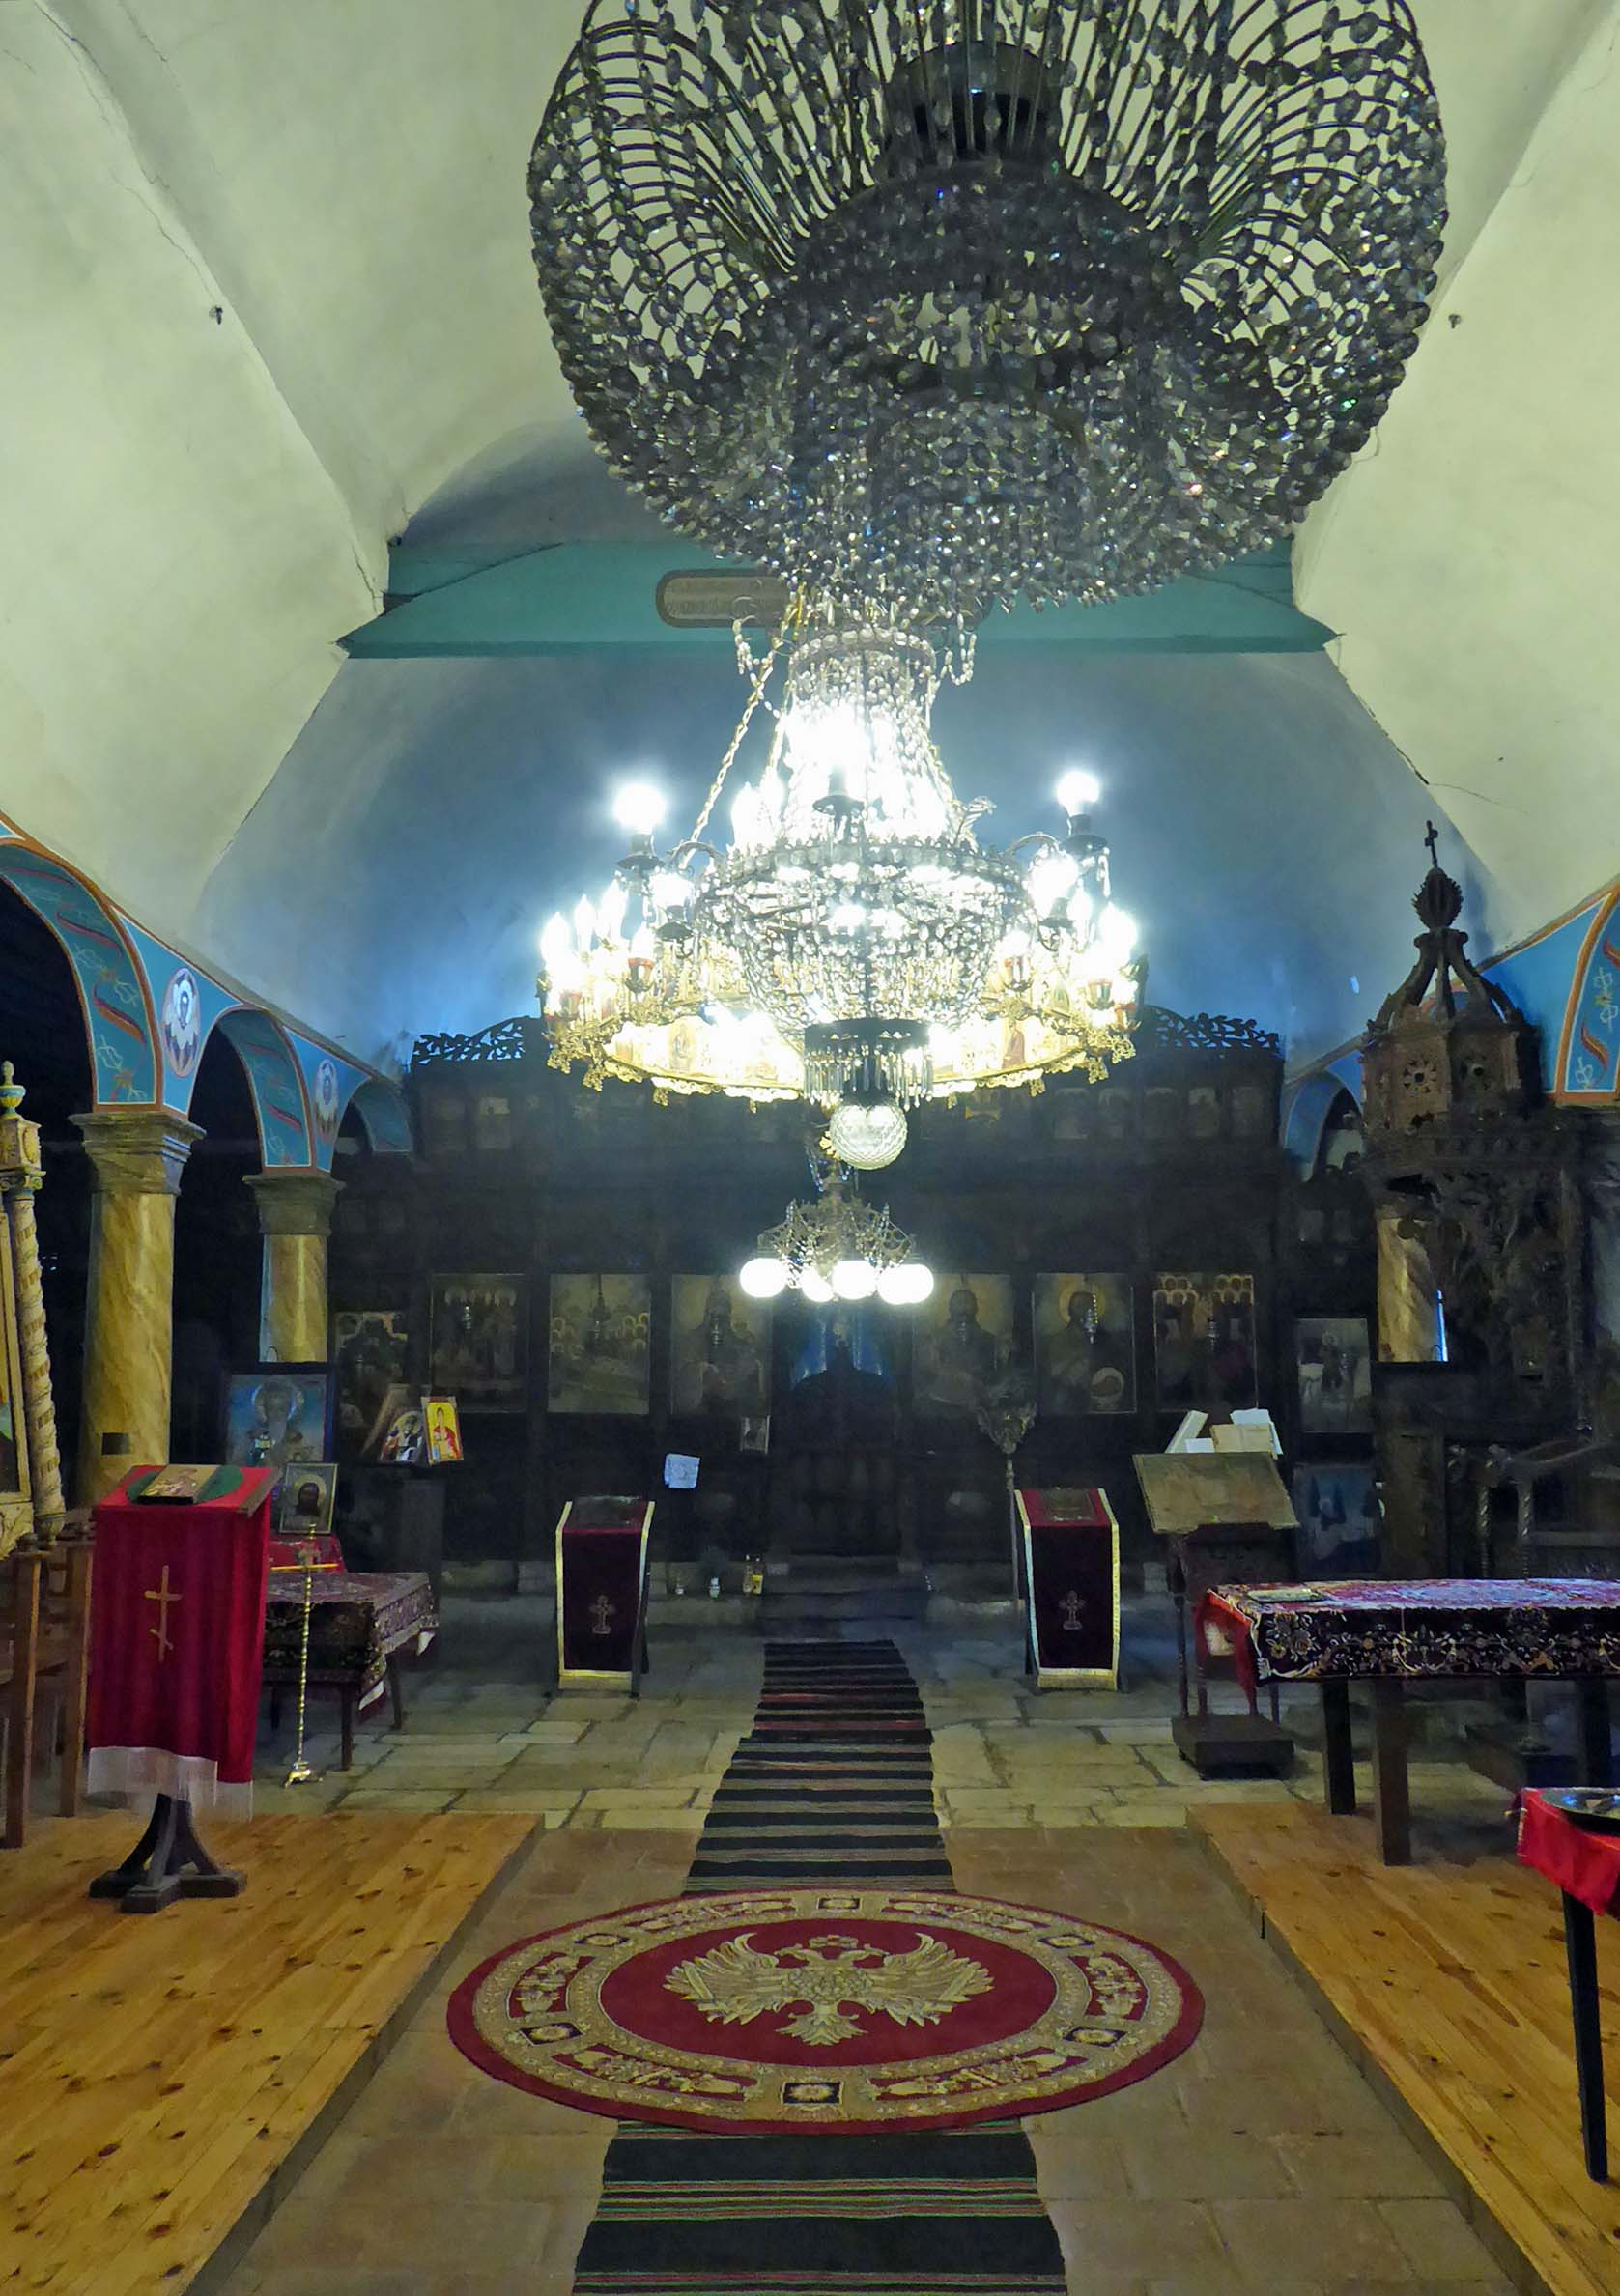 Church interior with chandelier